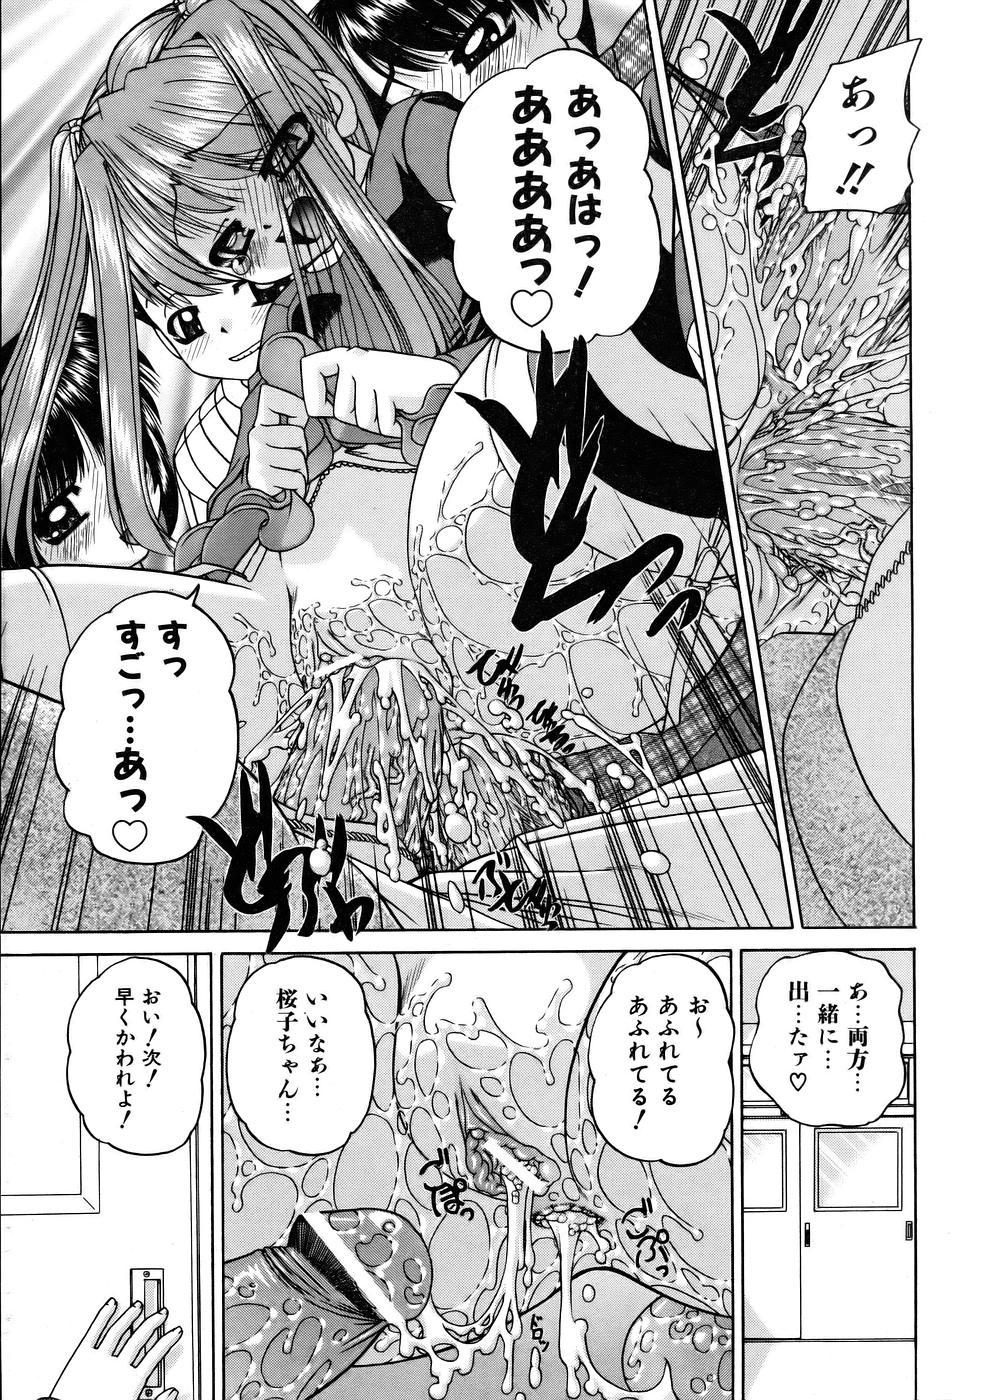 COMIC AUN 2005-10 Vol. 113 278